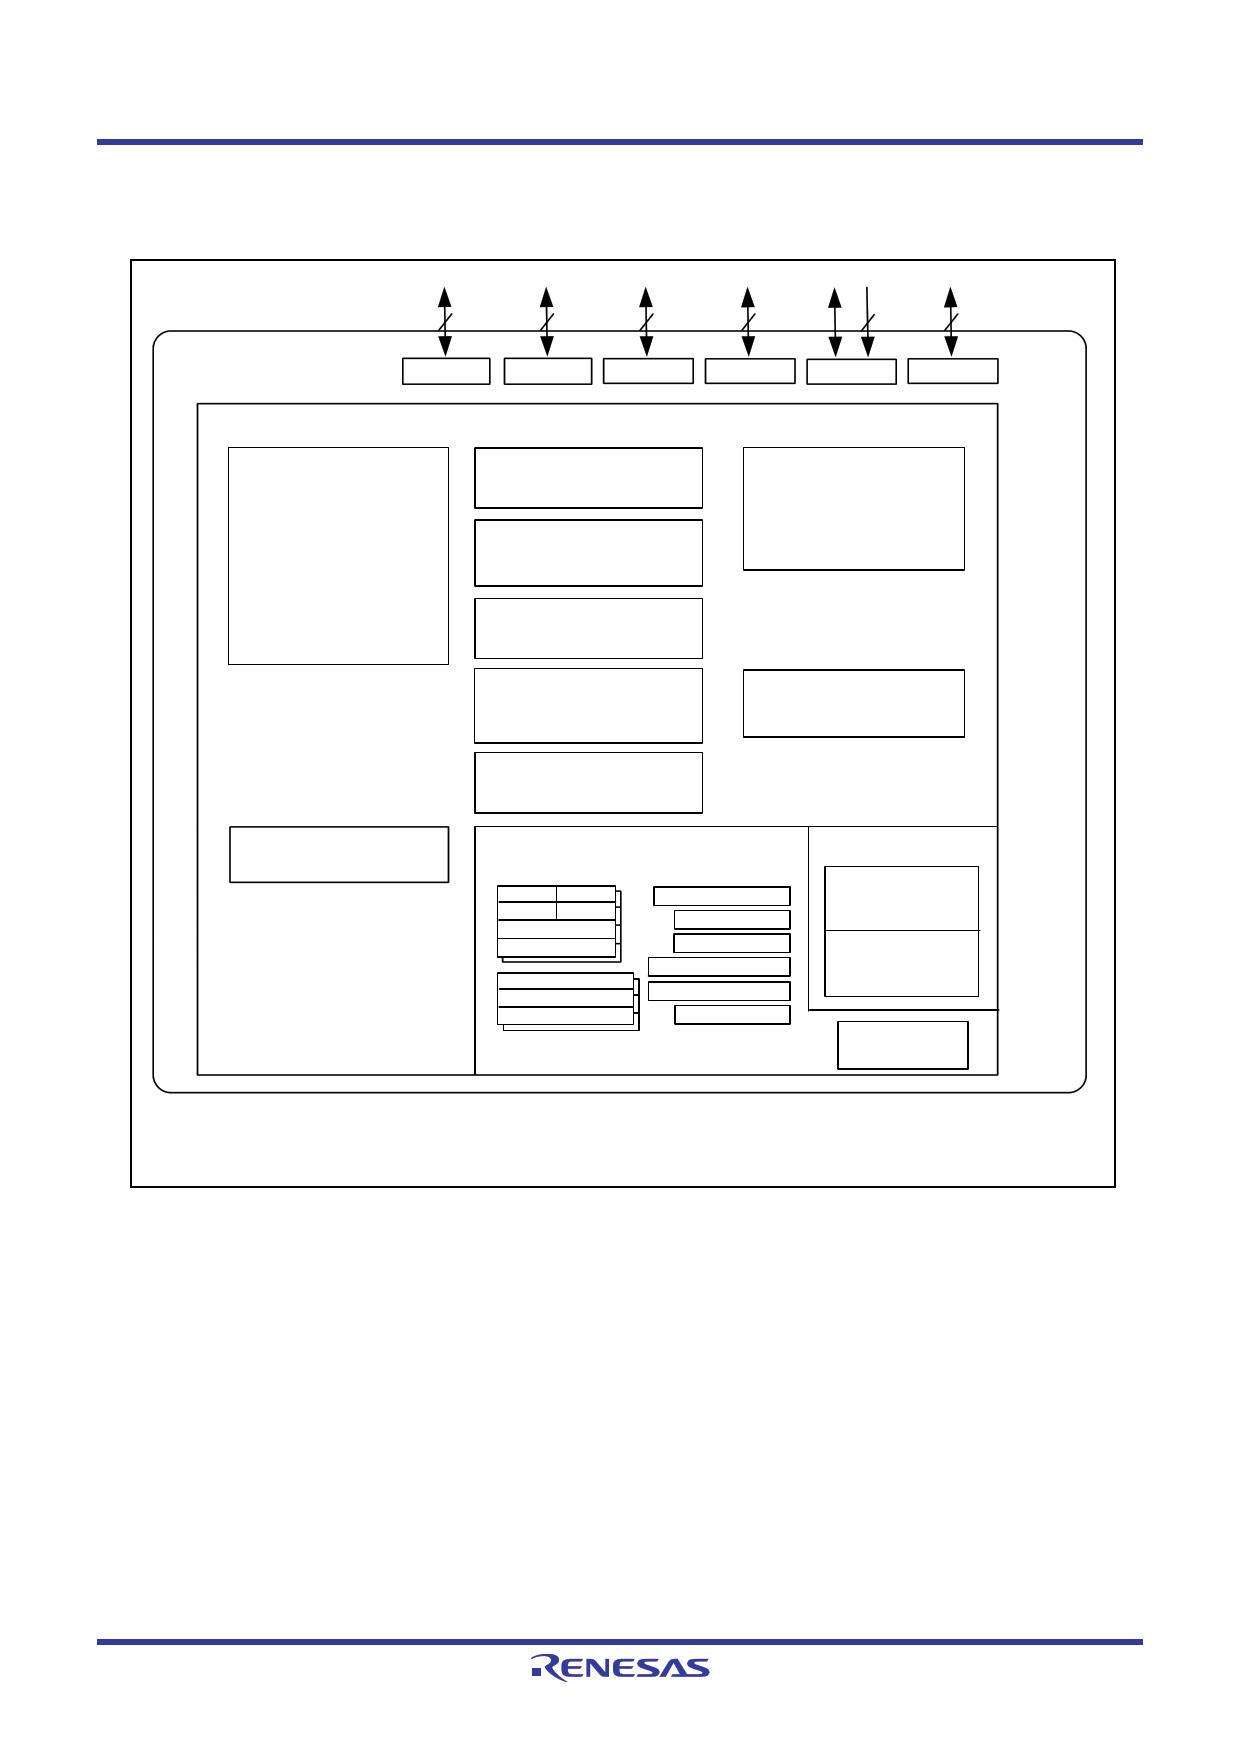 R5F21227DFP pdf, 반도체, 판매, 대치품